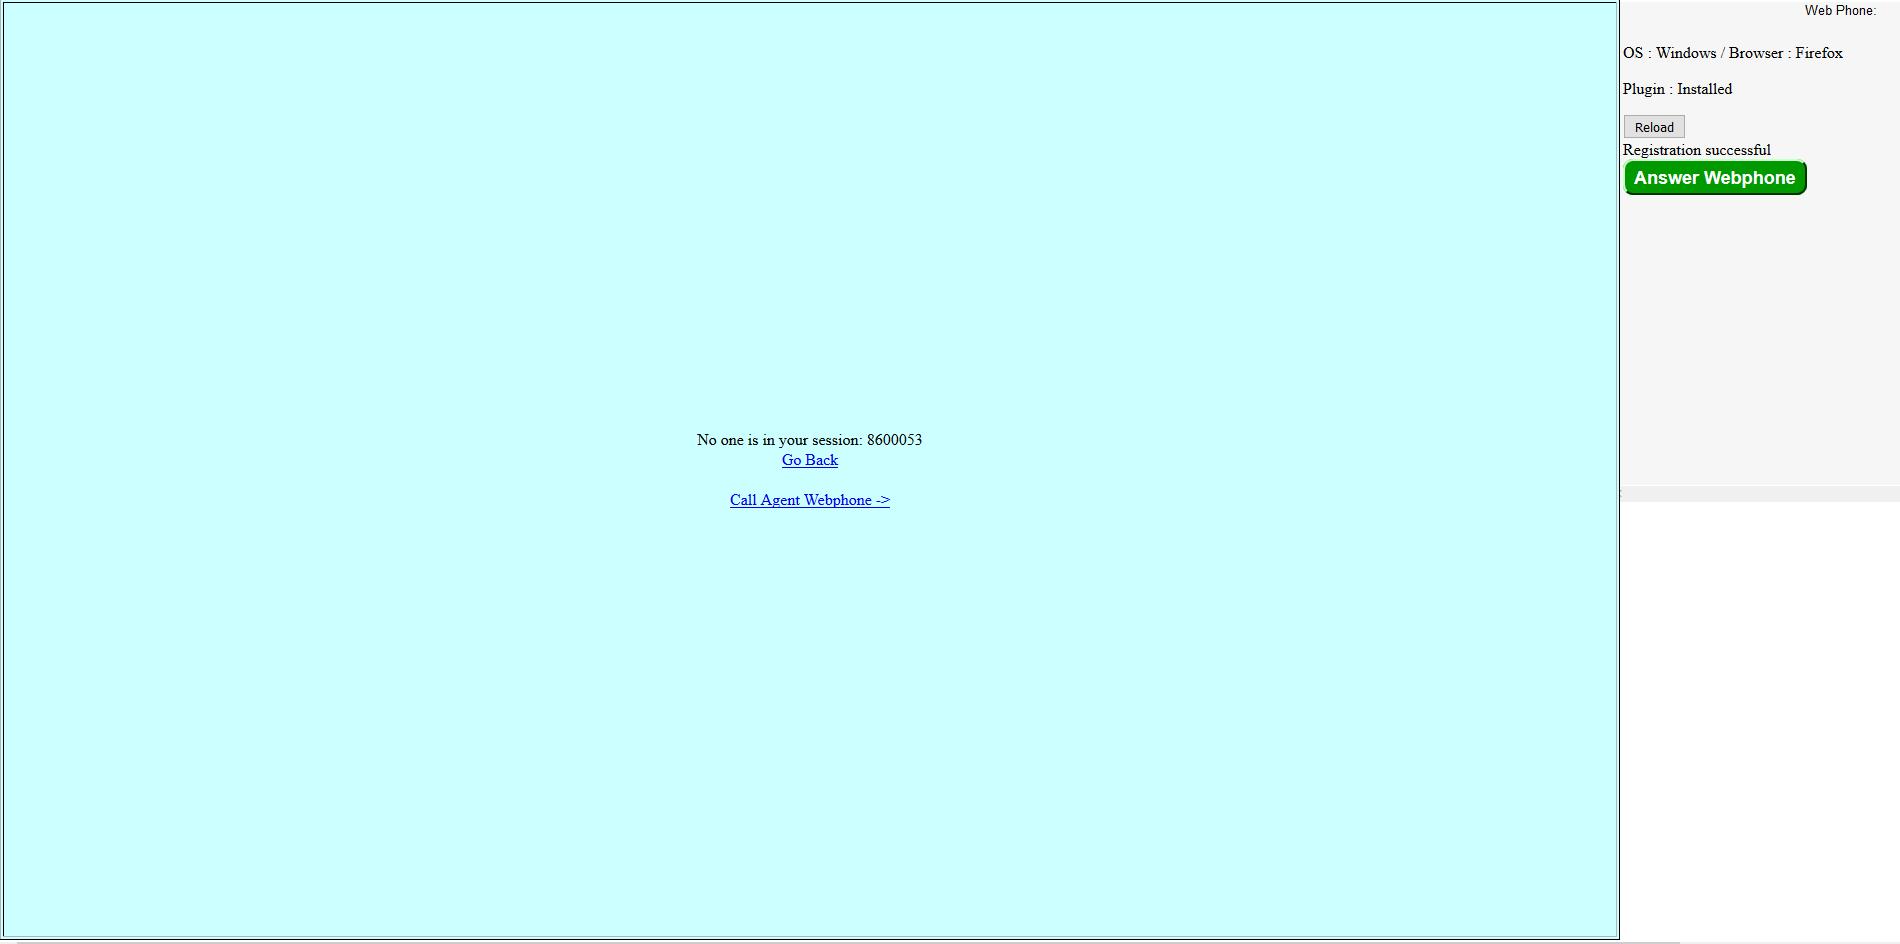 GitHub - iboam/Vici-Linphone: Vicidial Webphone